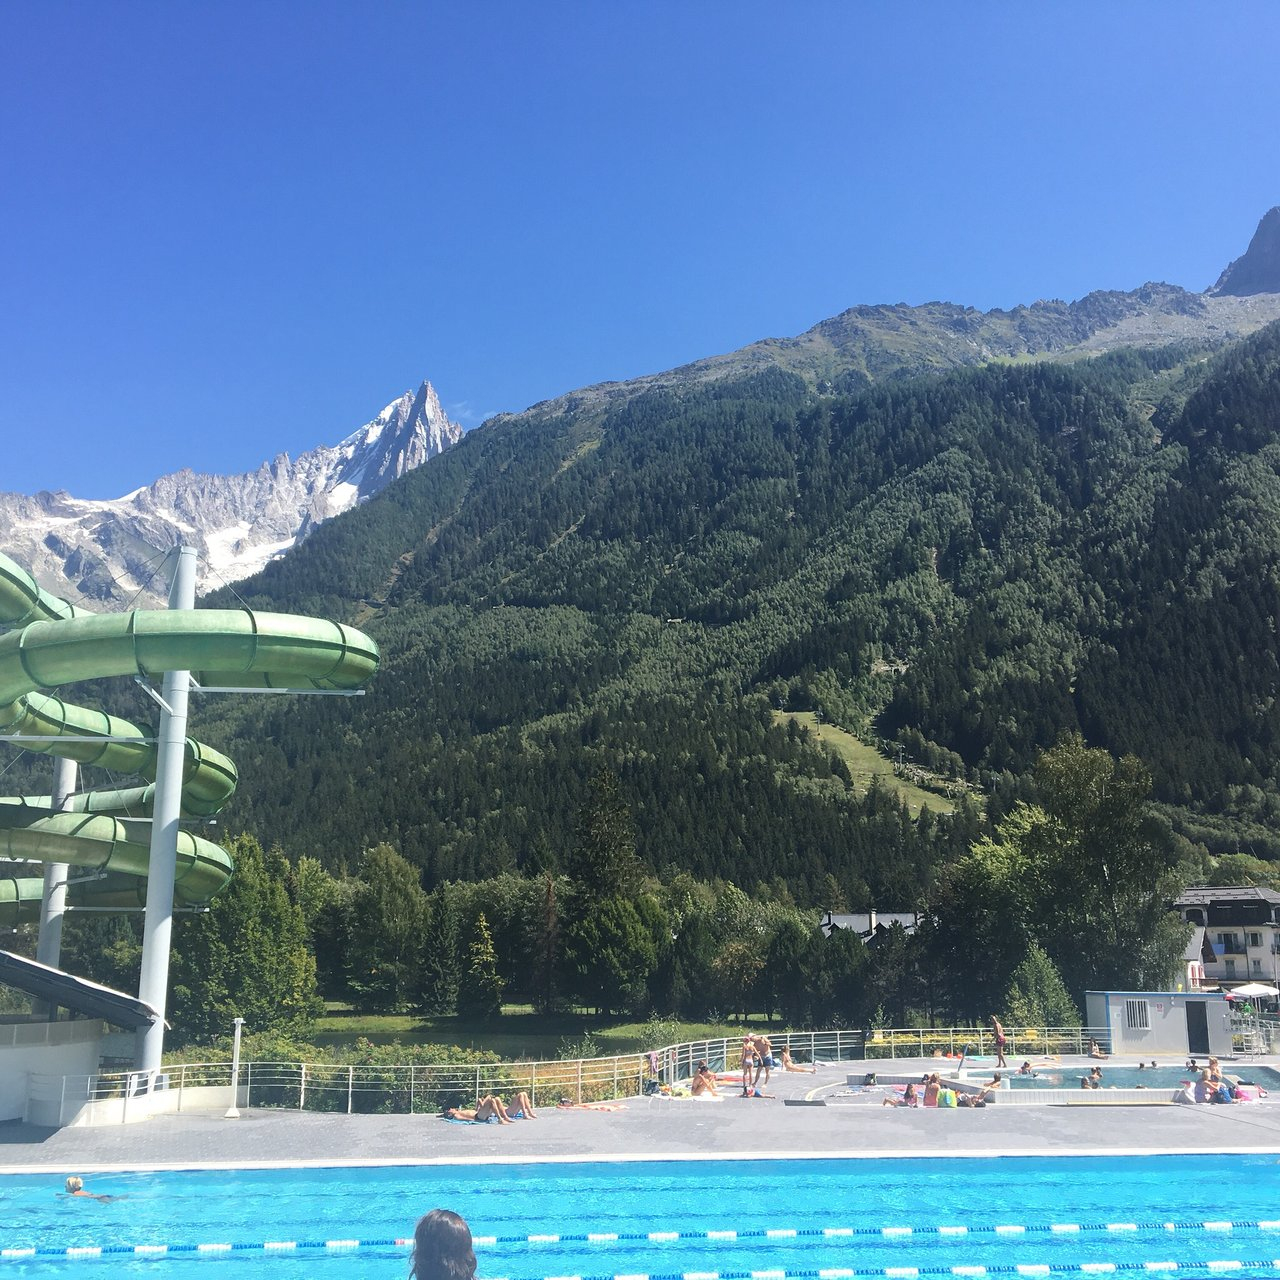 Piscine Et Centre Sportif Richard-Bozon (Chamonix ... concernant Chamonix Piscine